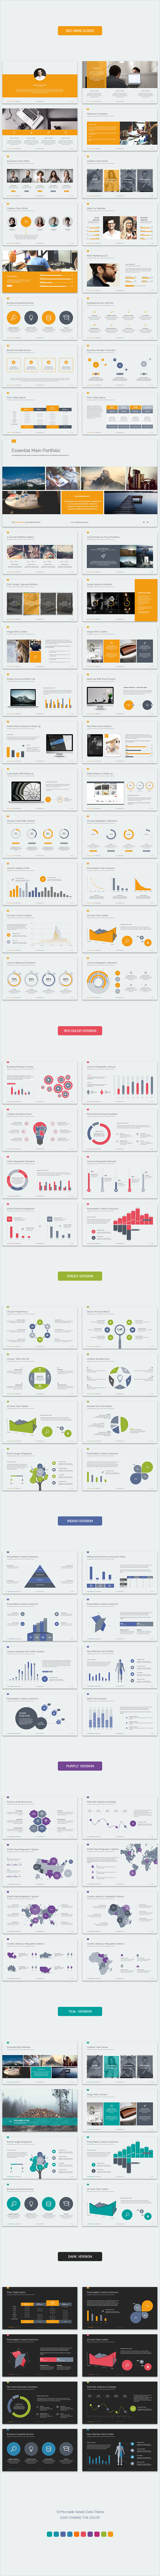 Wix - Presentation Template - 2